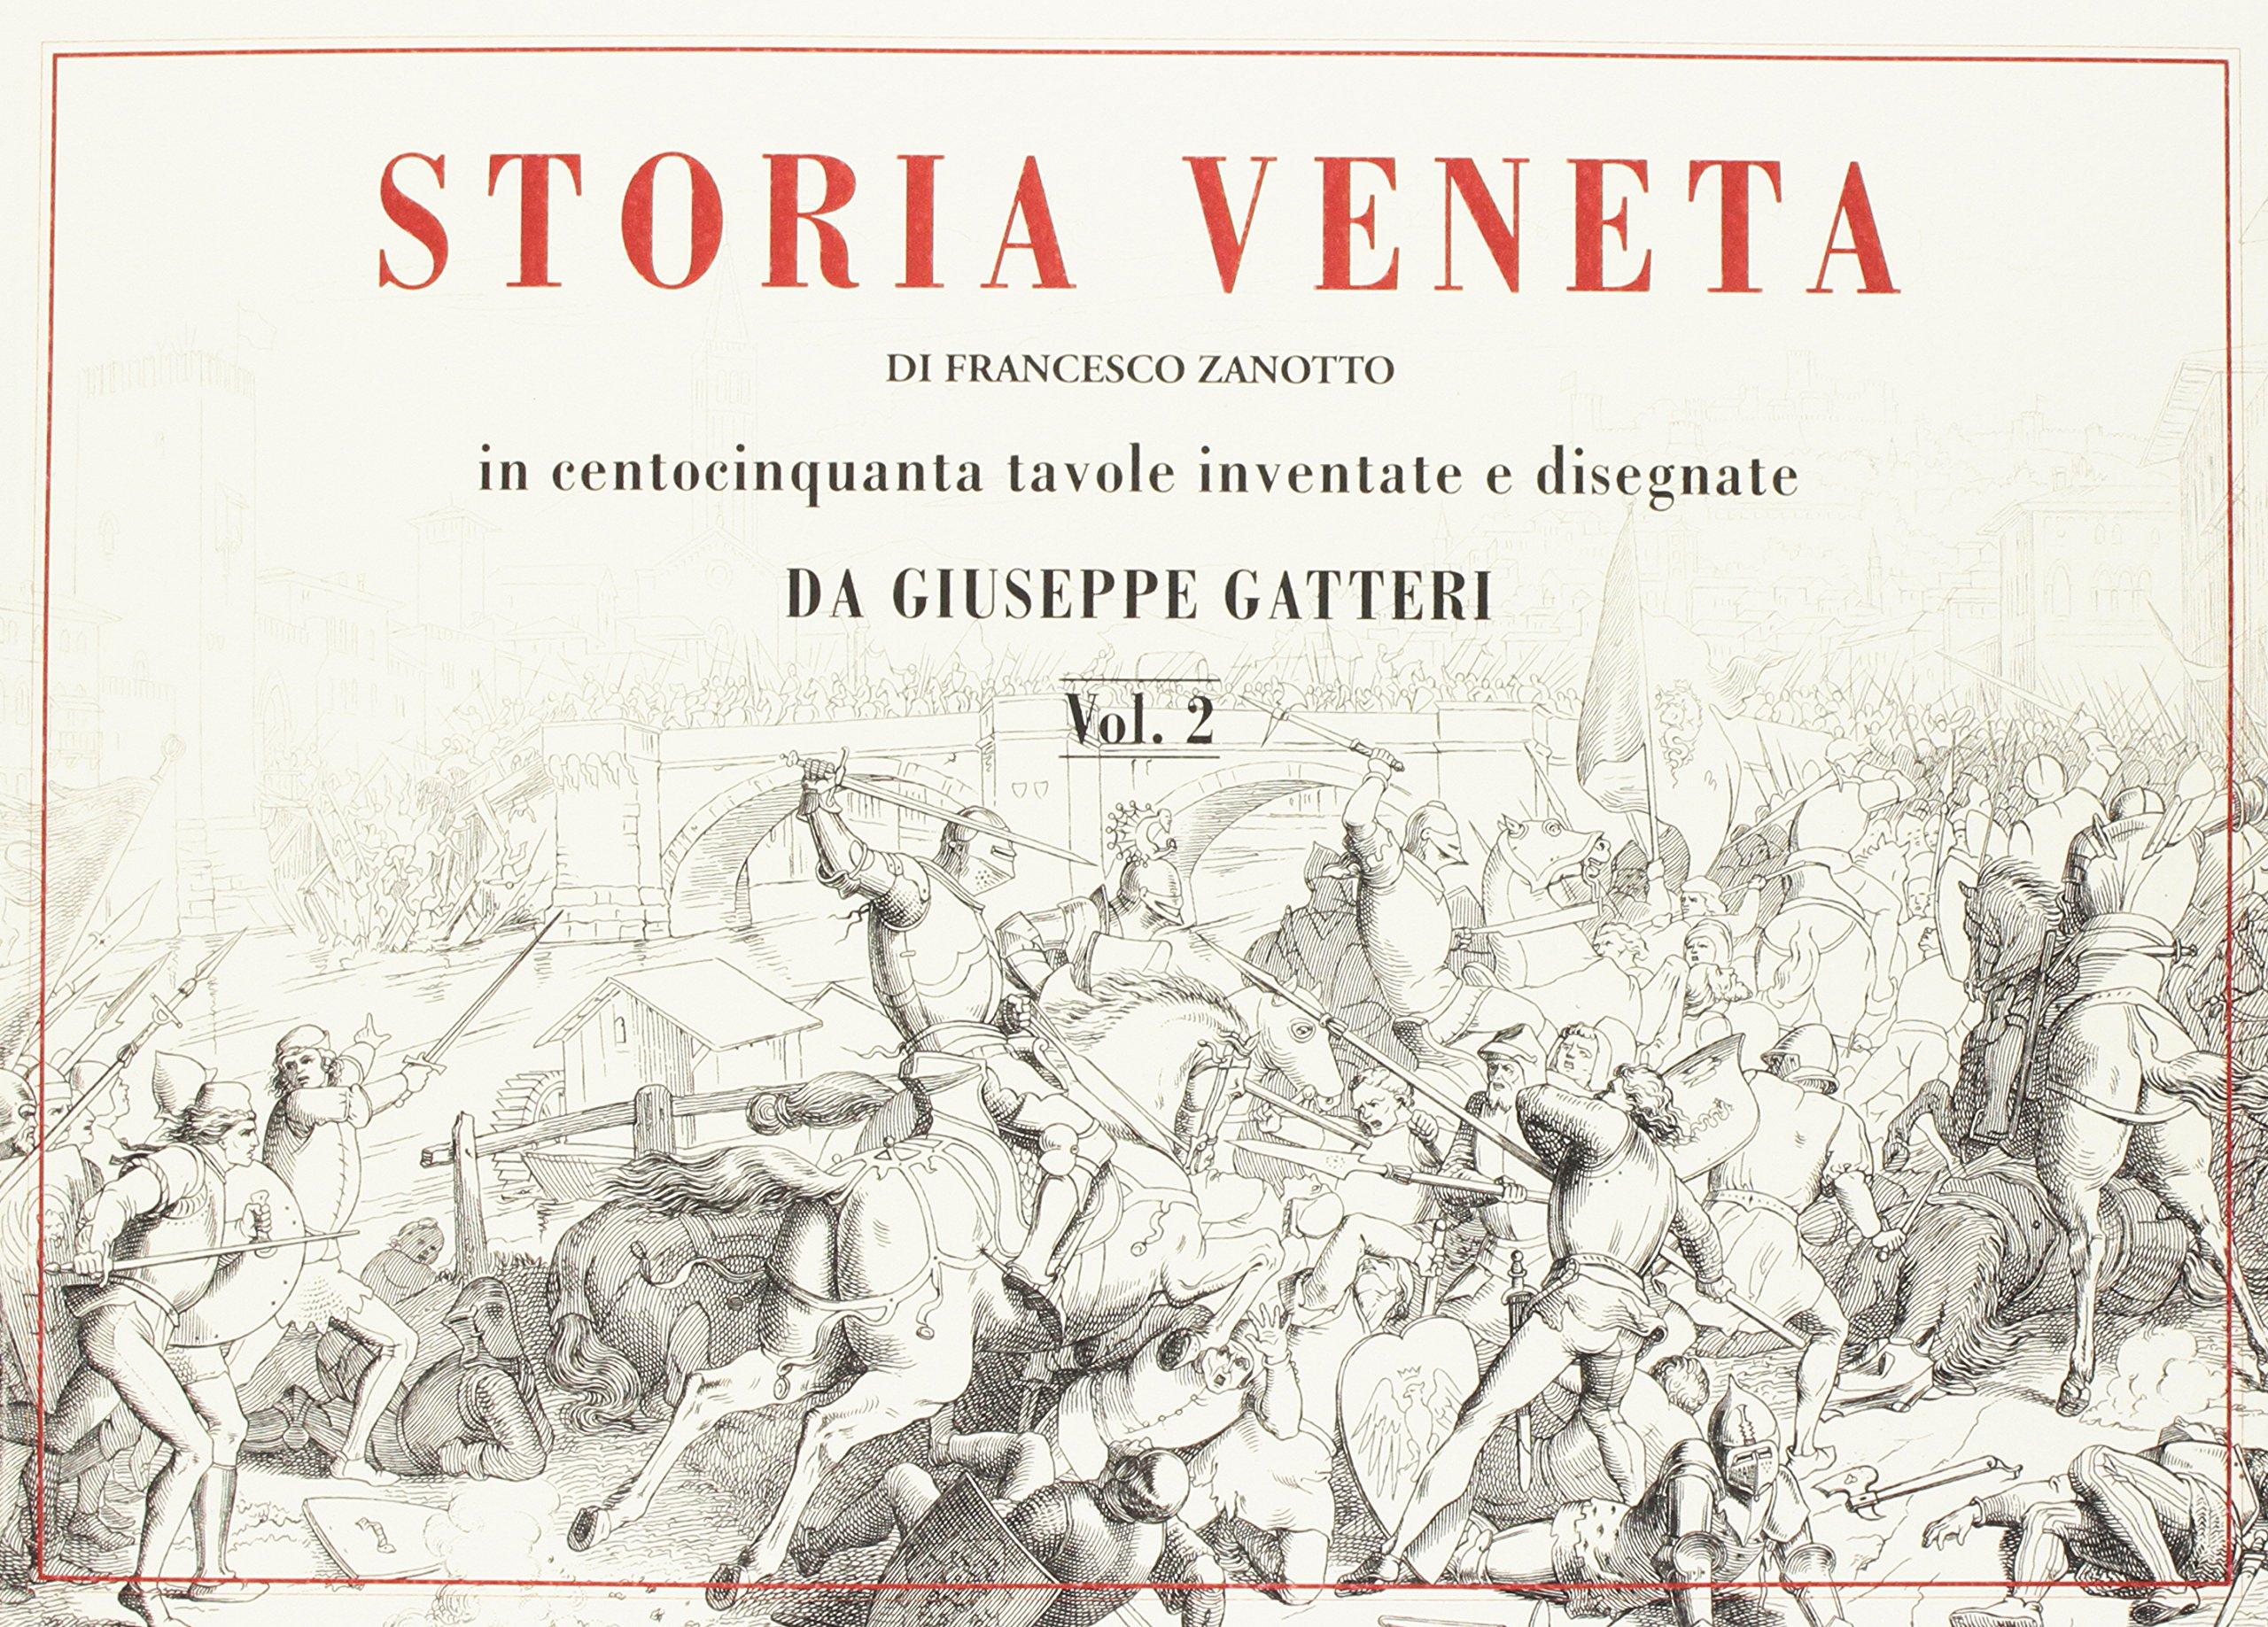 Stroia veneta Zanotto-Gatteri vol. 2